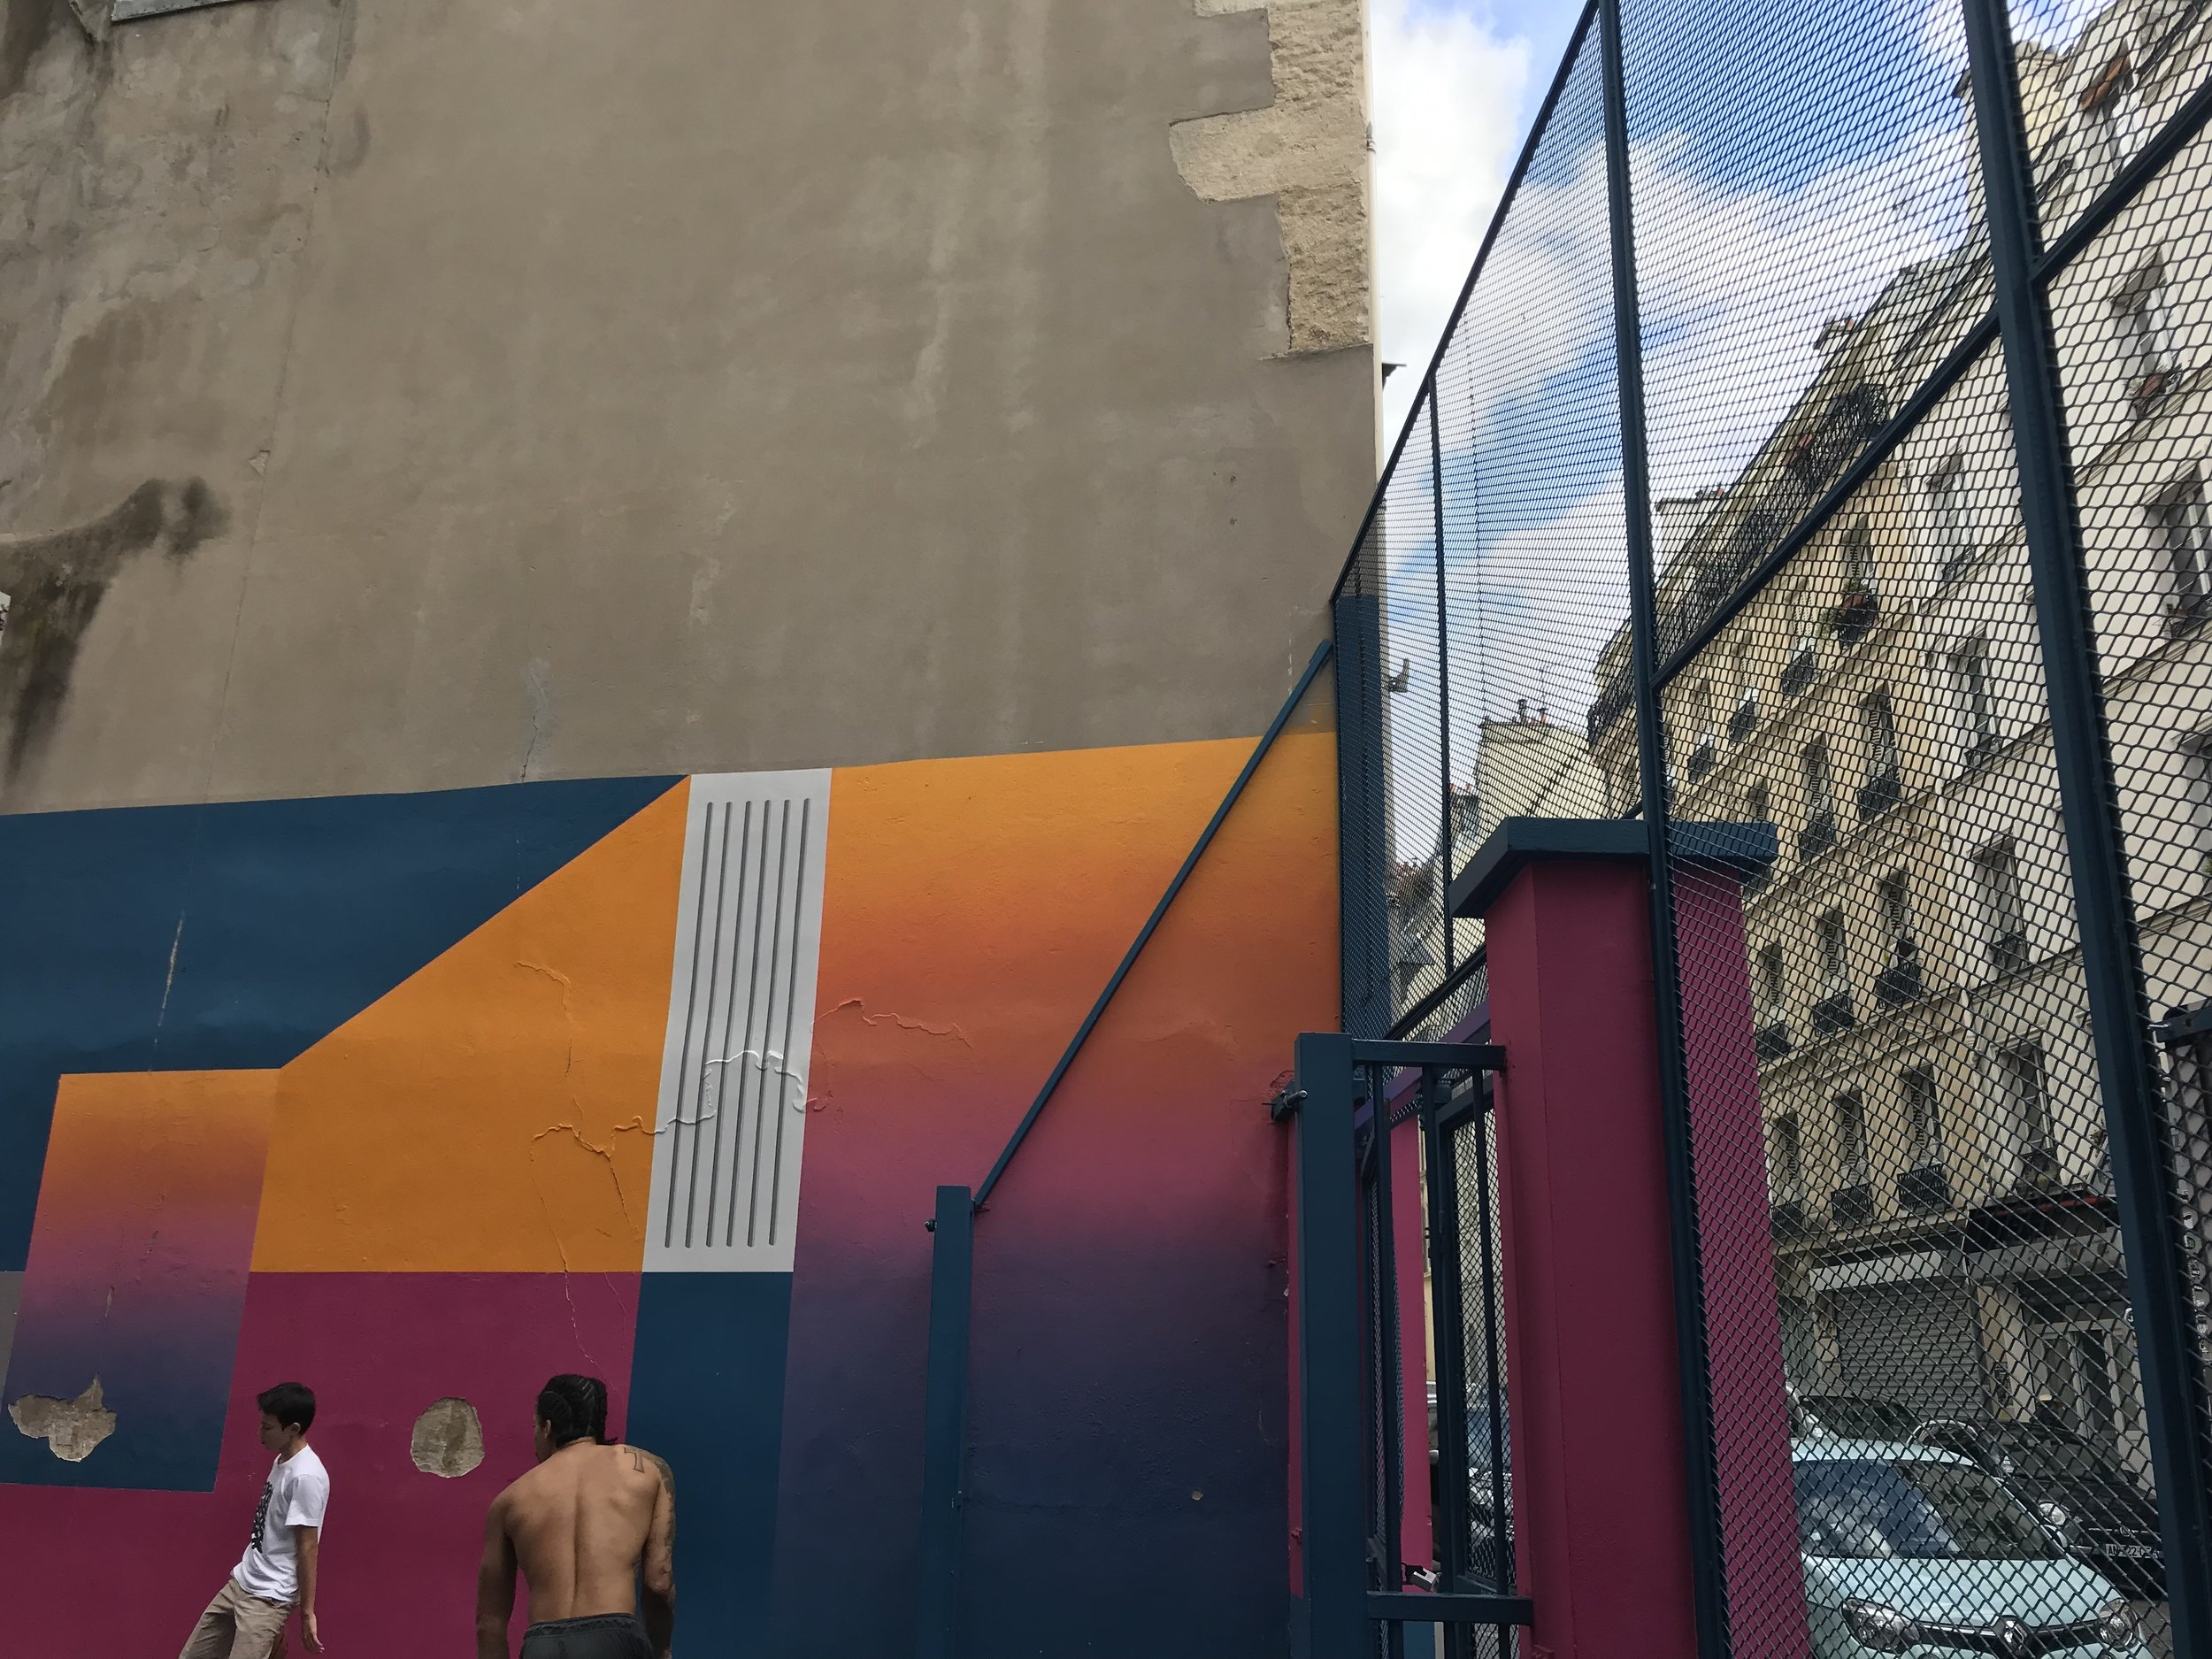 Pigalle Basketball Court, Paris 2019